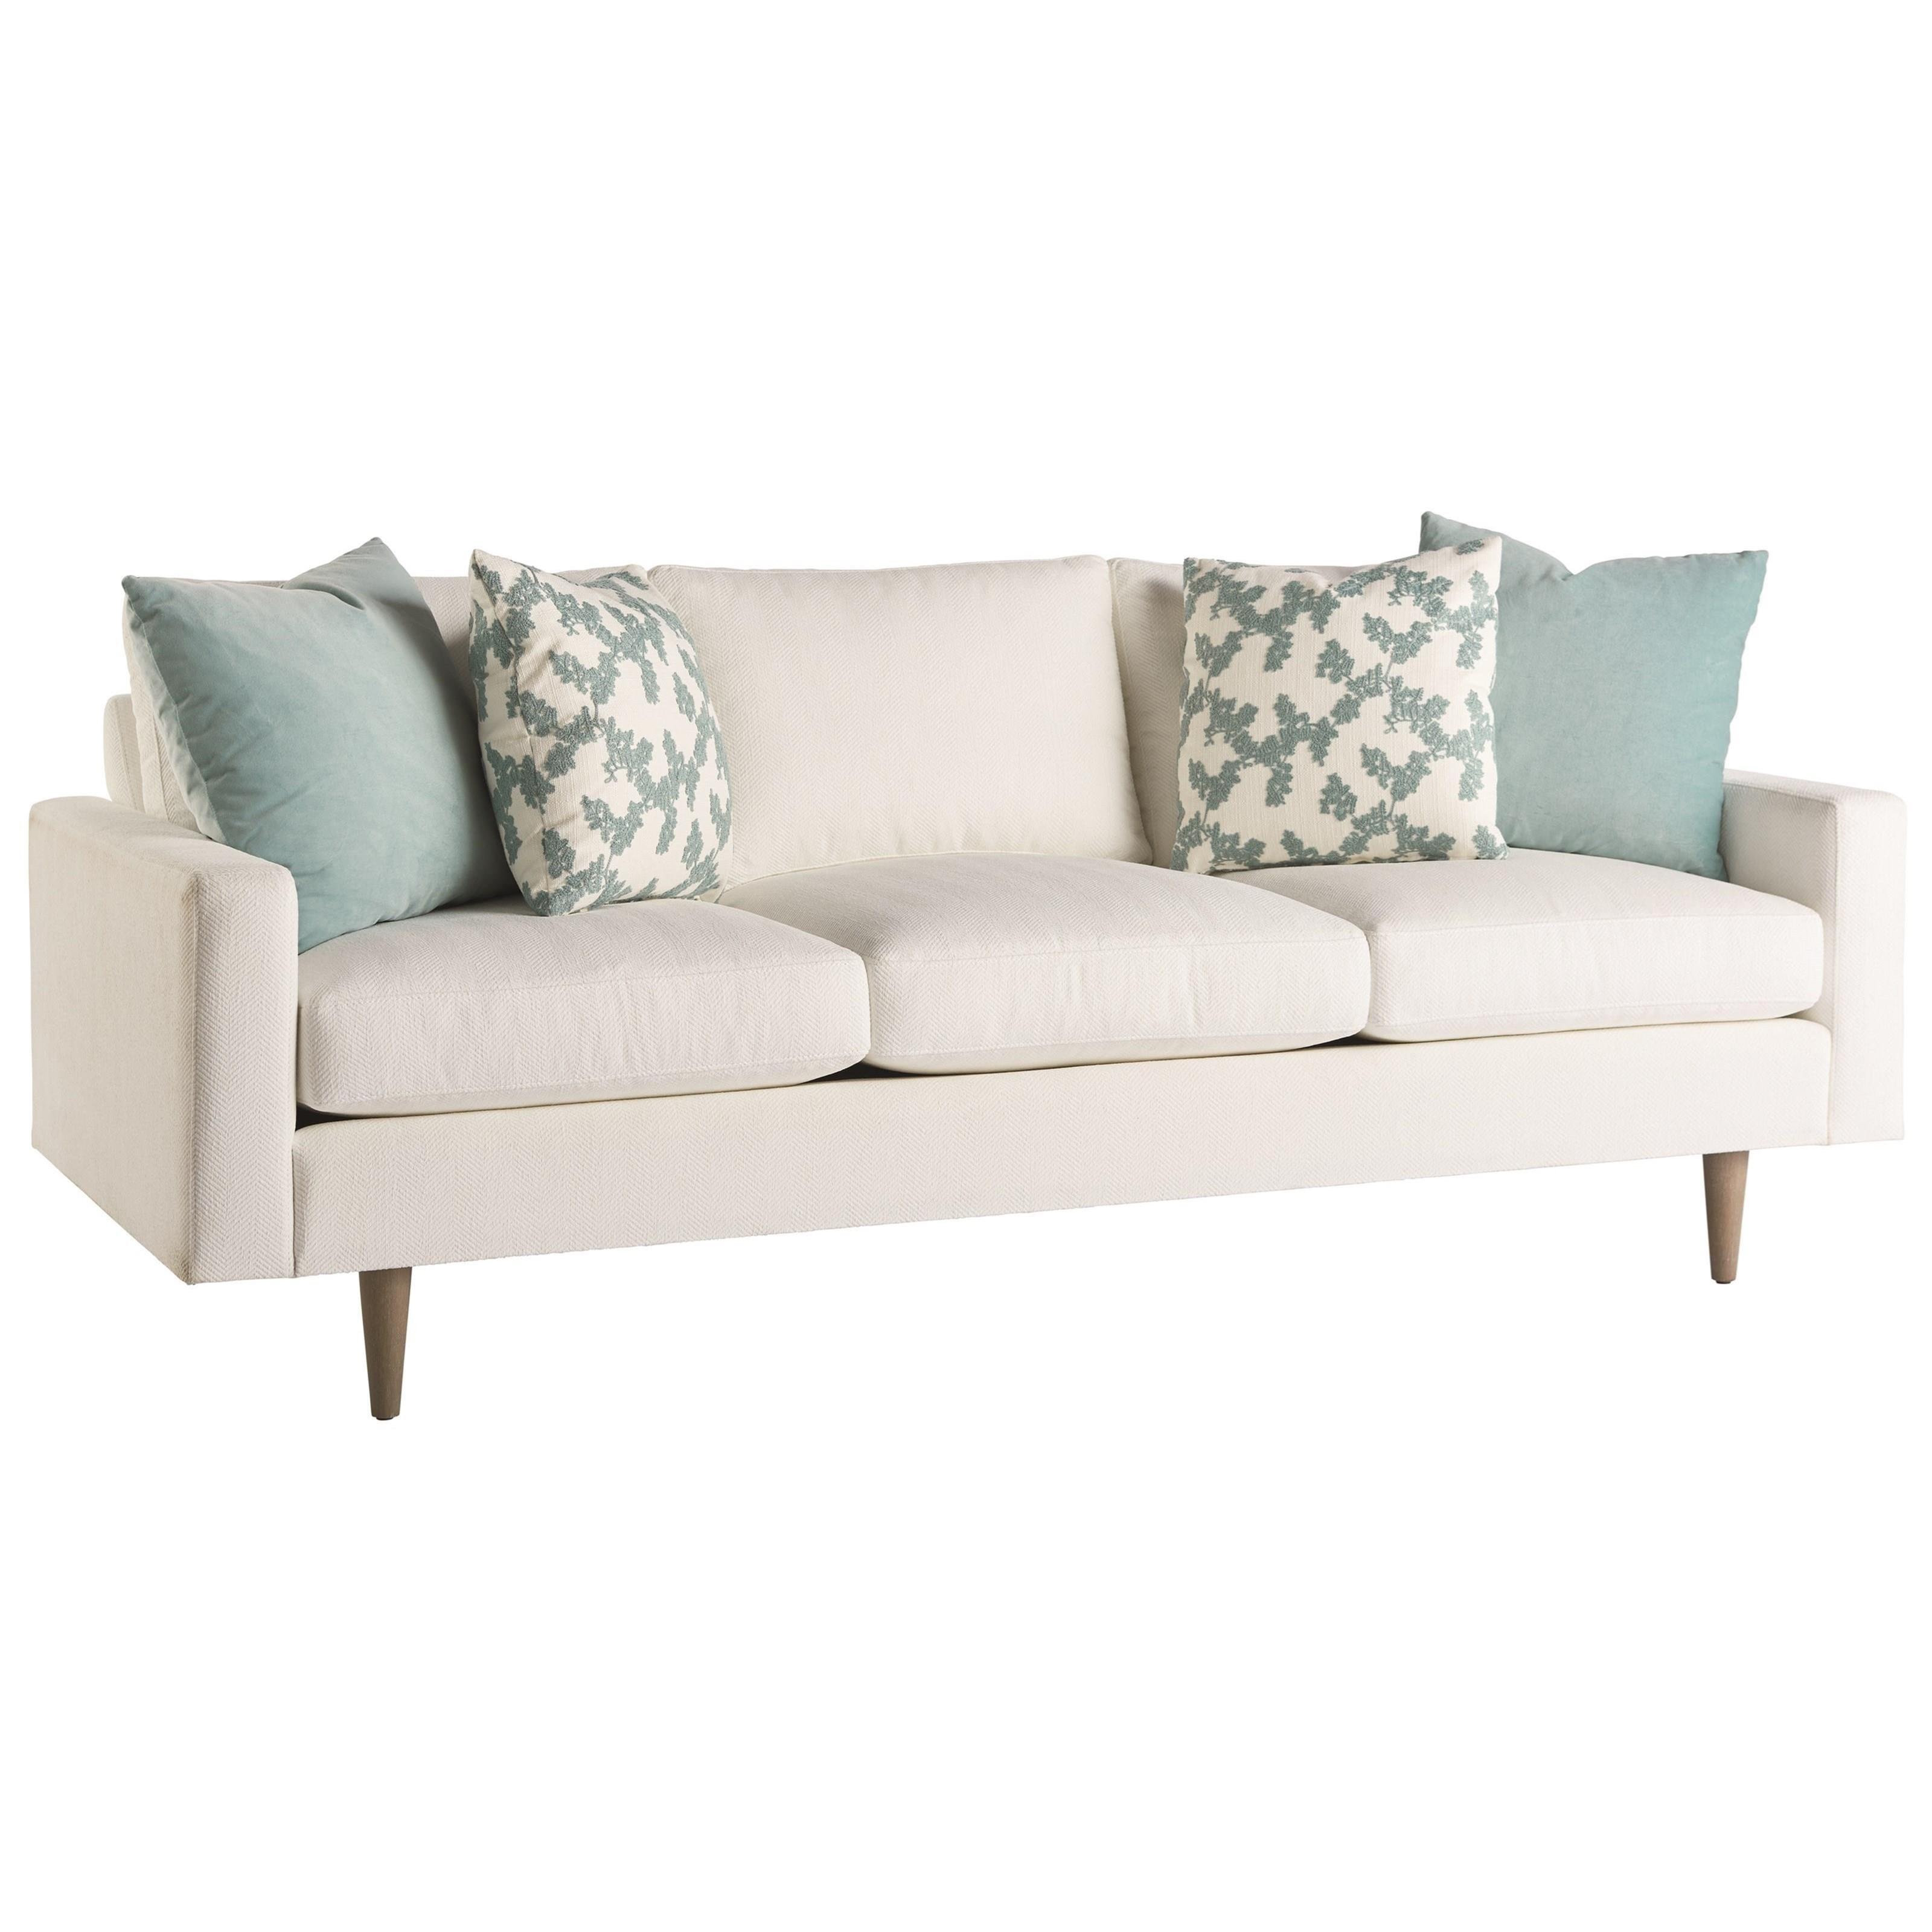 Love. Joy. Bliss.-Miranda Kerr Home Brentwood Sofa by Universal at Baer's Furniture